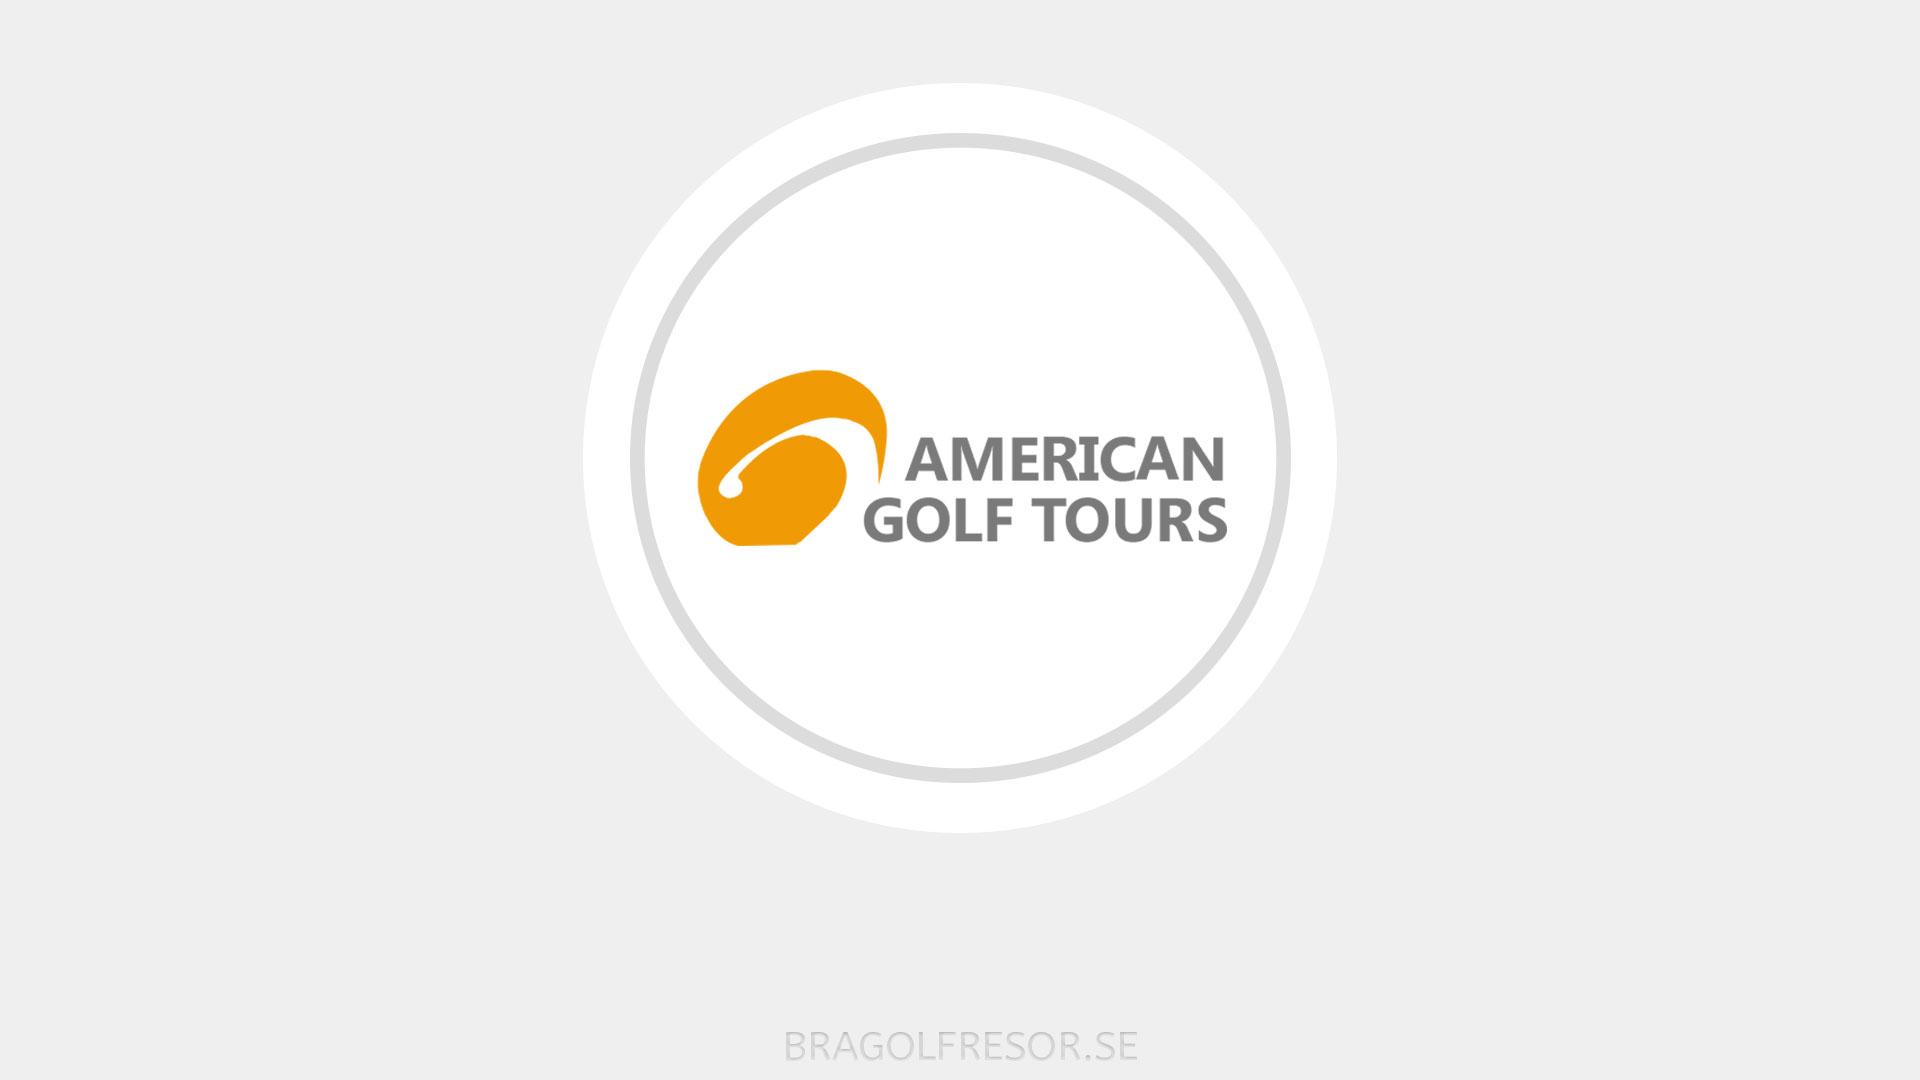 American Golf Tours